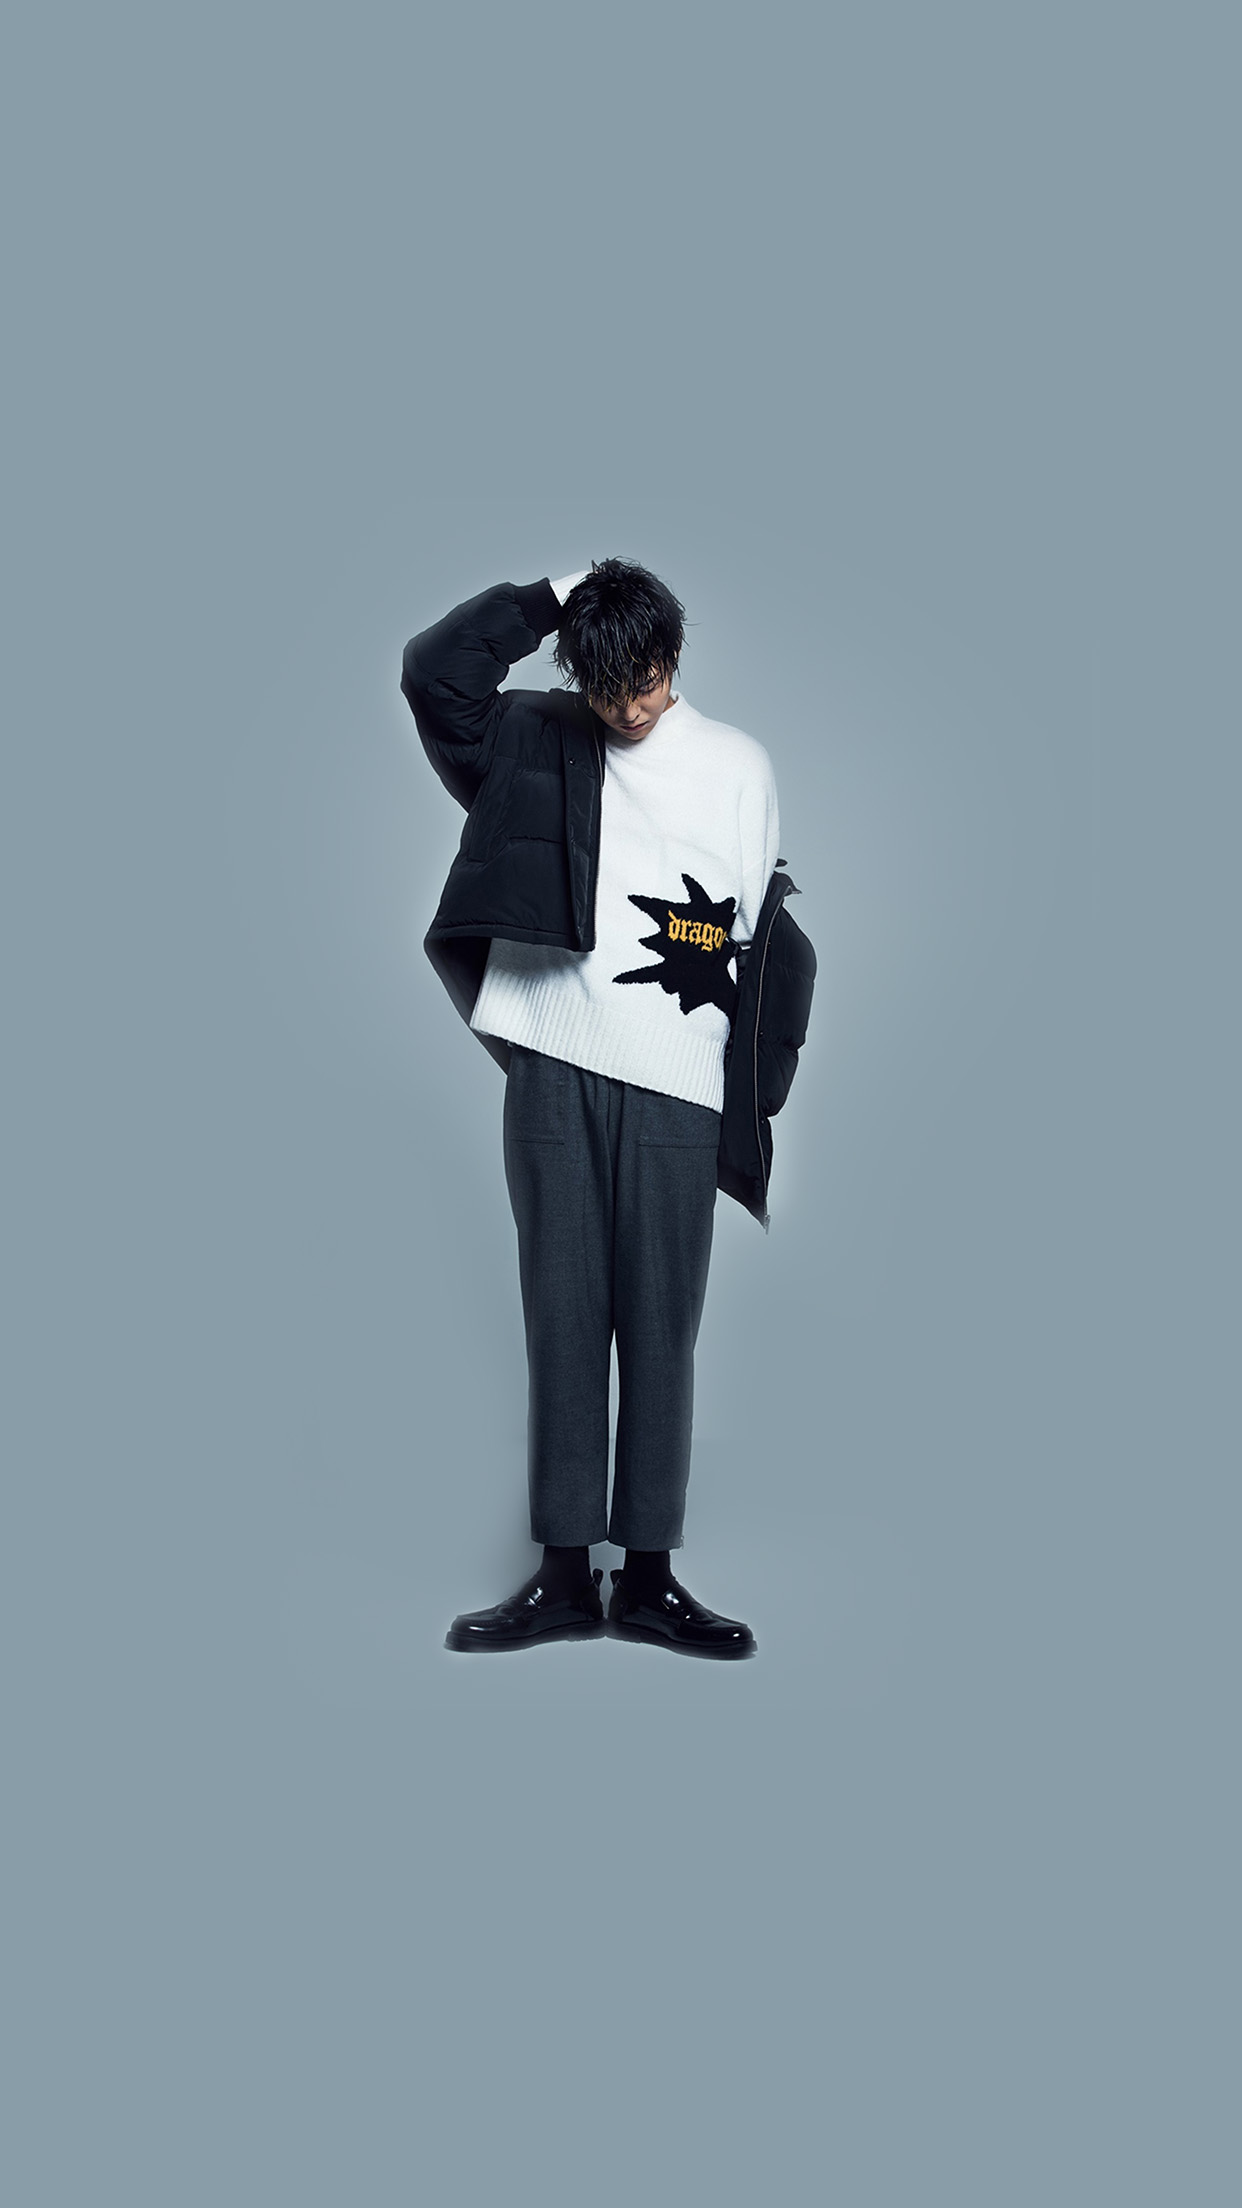 Gdragon Bigbang Yg Kpop Boy Android Wallpaper Android Hd Wallpapers